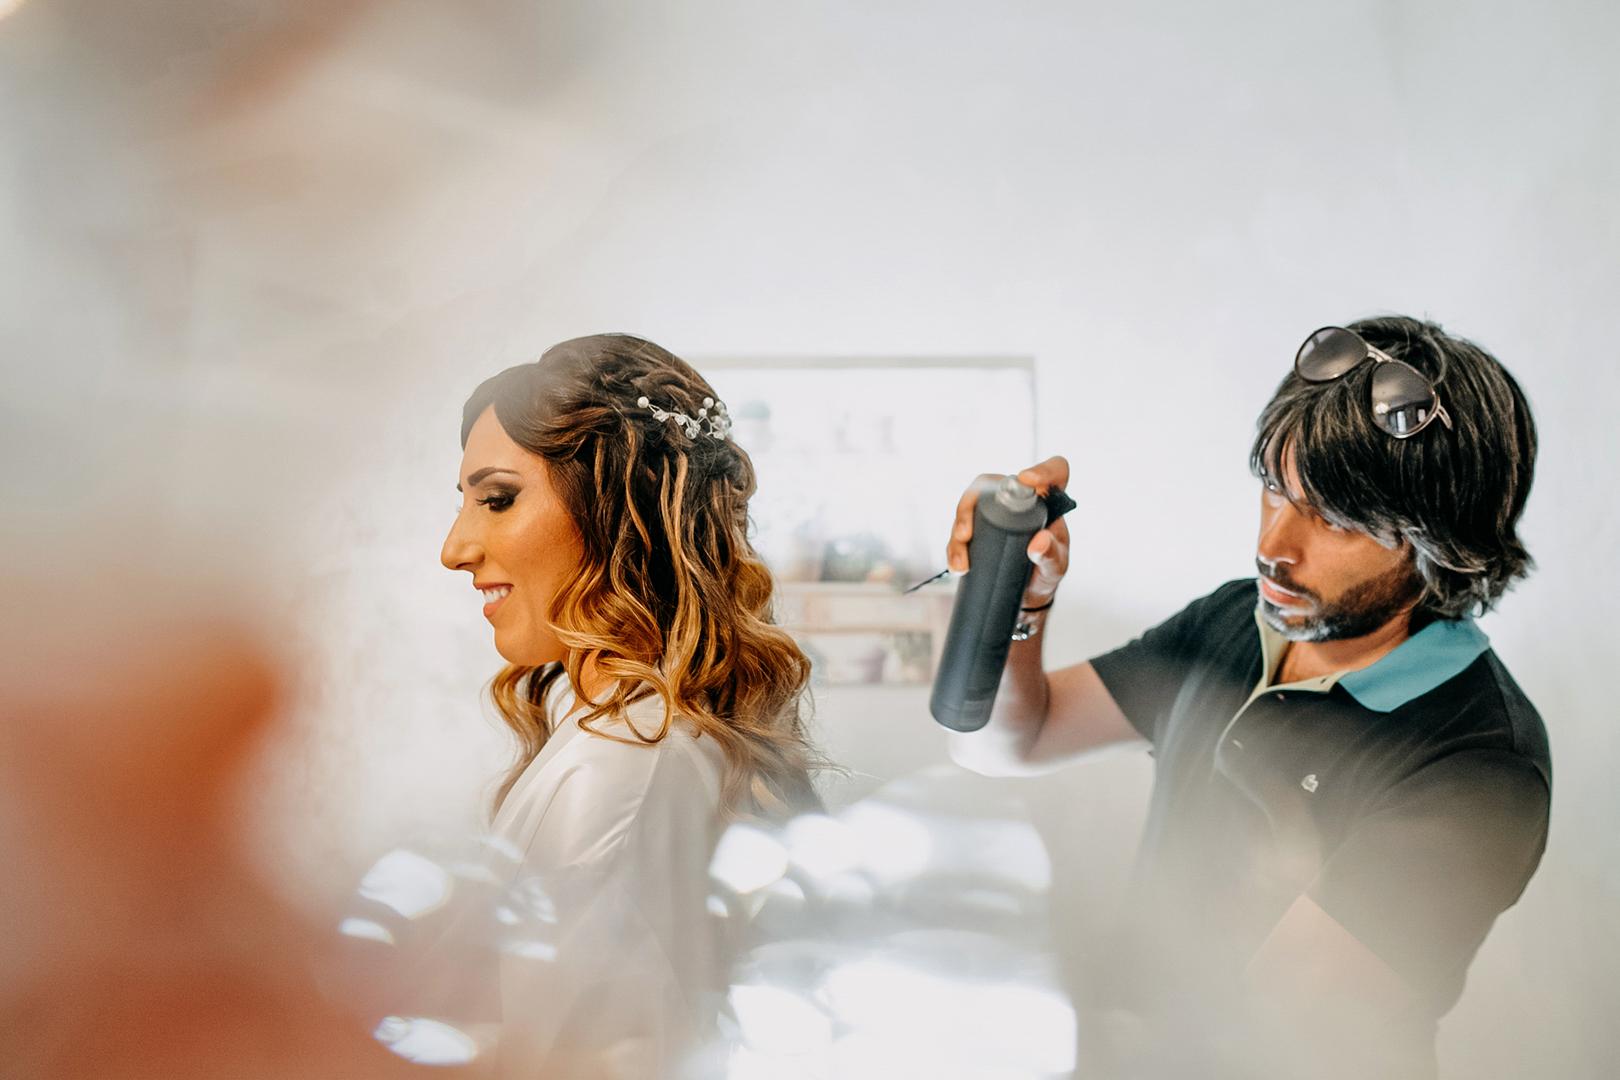 2 gianni-lepore-preparativi-sposa